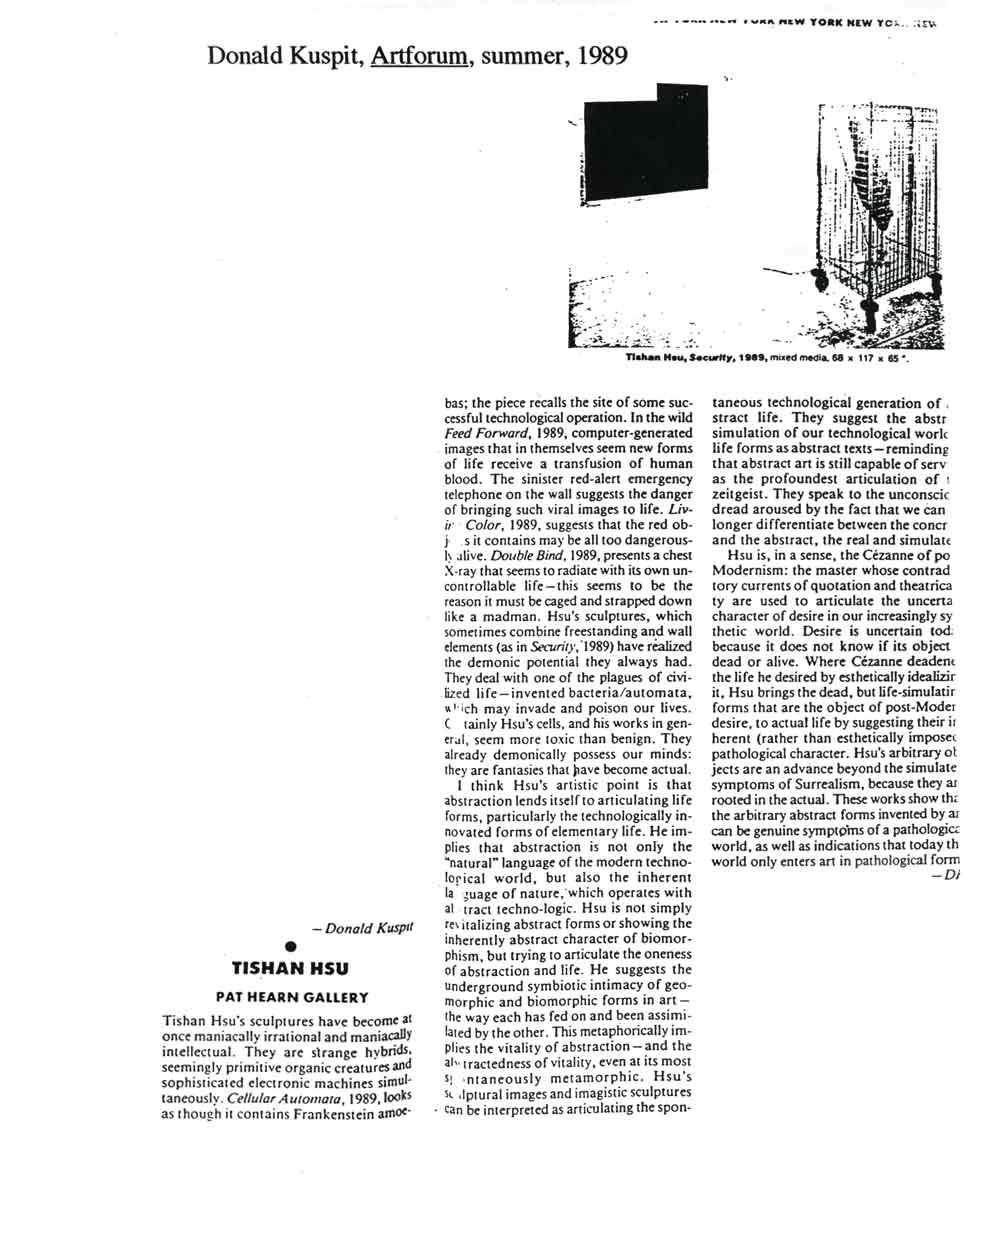 Tishan Hsu: Pat Hearn Gallery, article